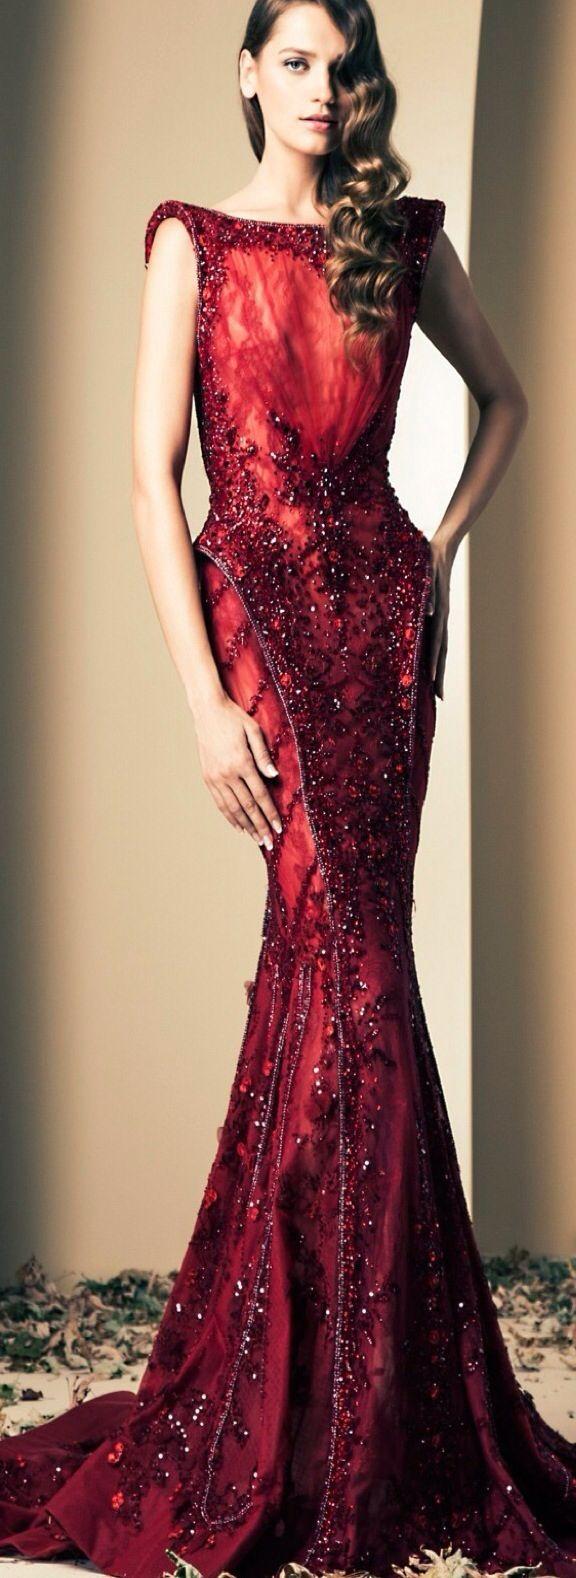 Ziad nakad wine red luxury mermaid evening gowns prom dresses